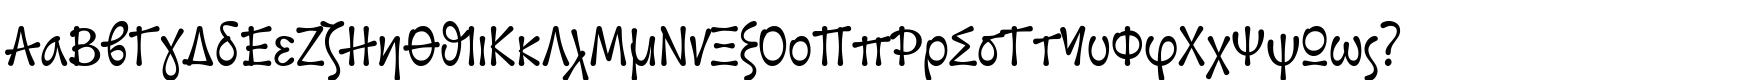 red_script_pro-webfont.ttf